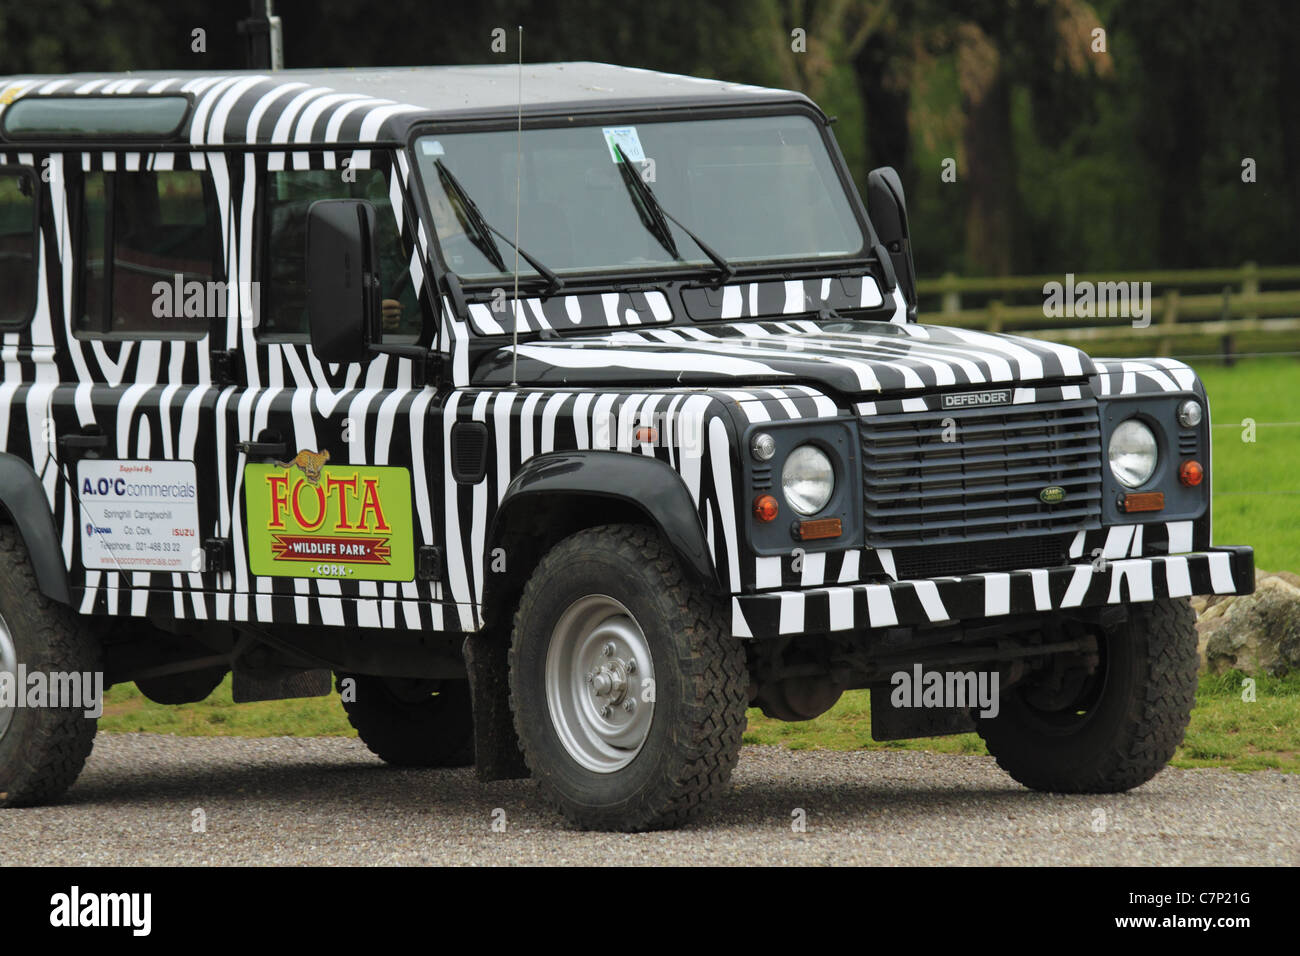 A Land Rover Safari Vehicle In Zebra Print Markings At Fota Wildlife